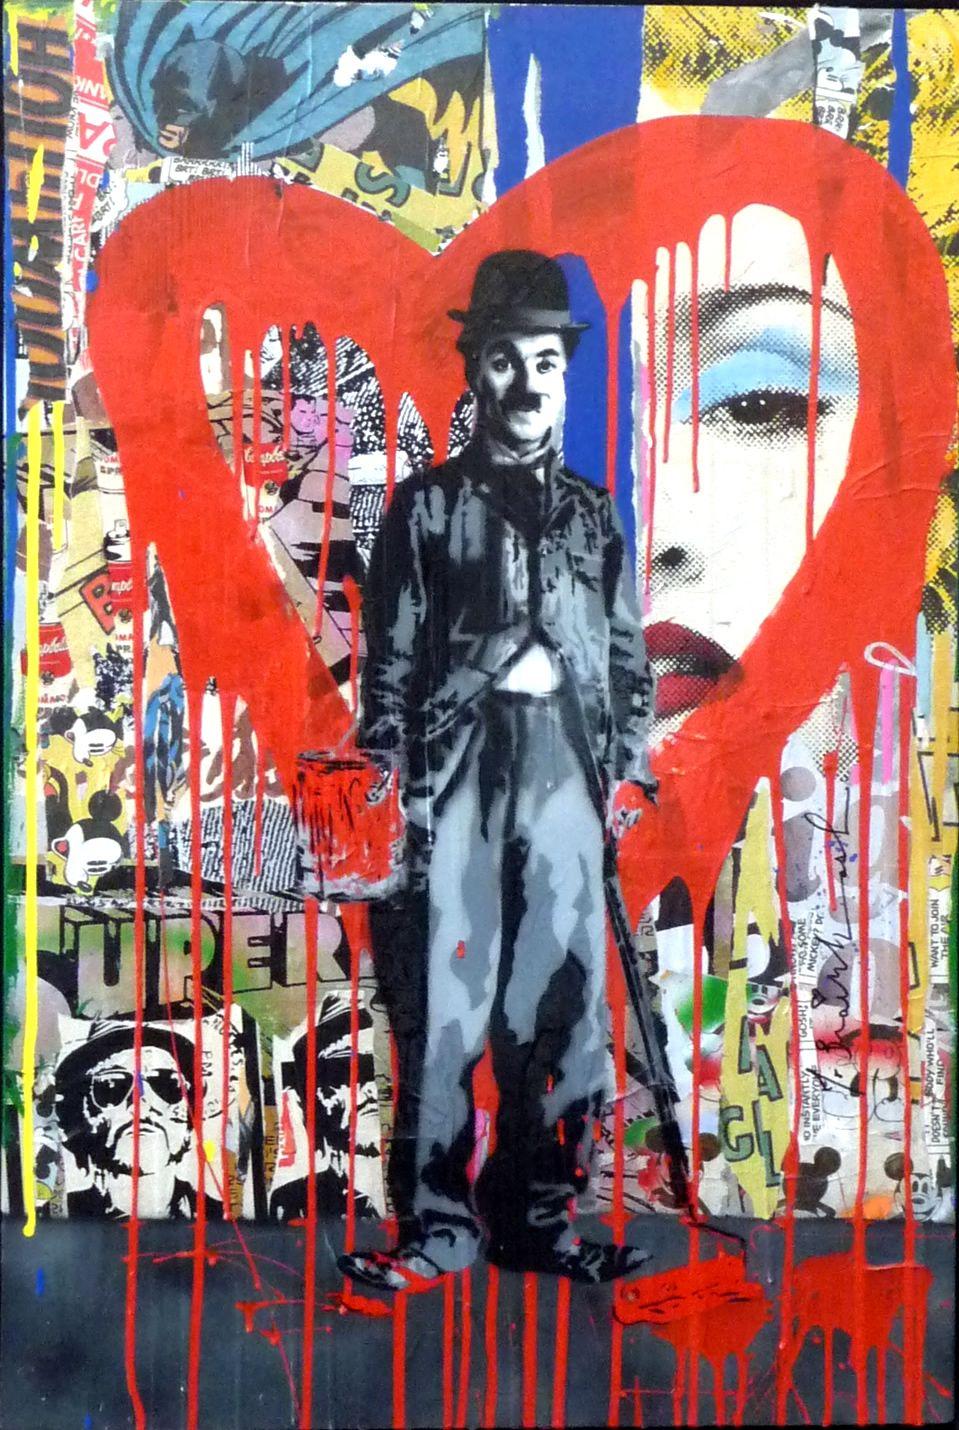 Graffiti art for sale canada - Charlie Chaplin And Madonna Street Art Graffiti Style Art By Mr